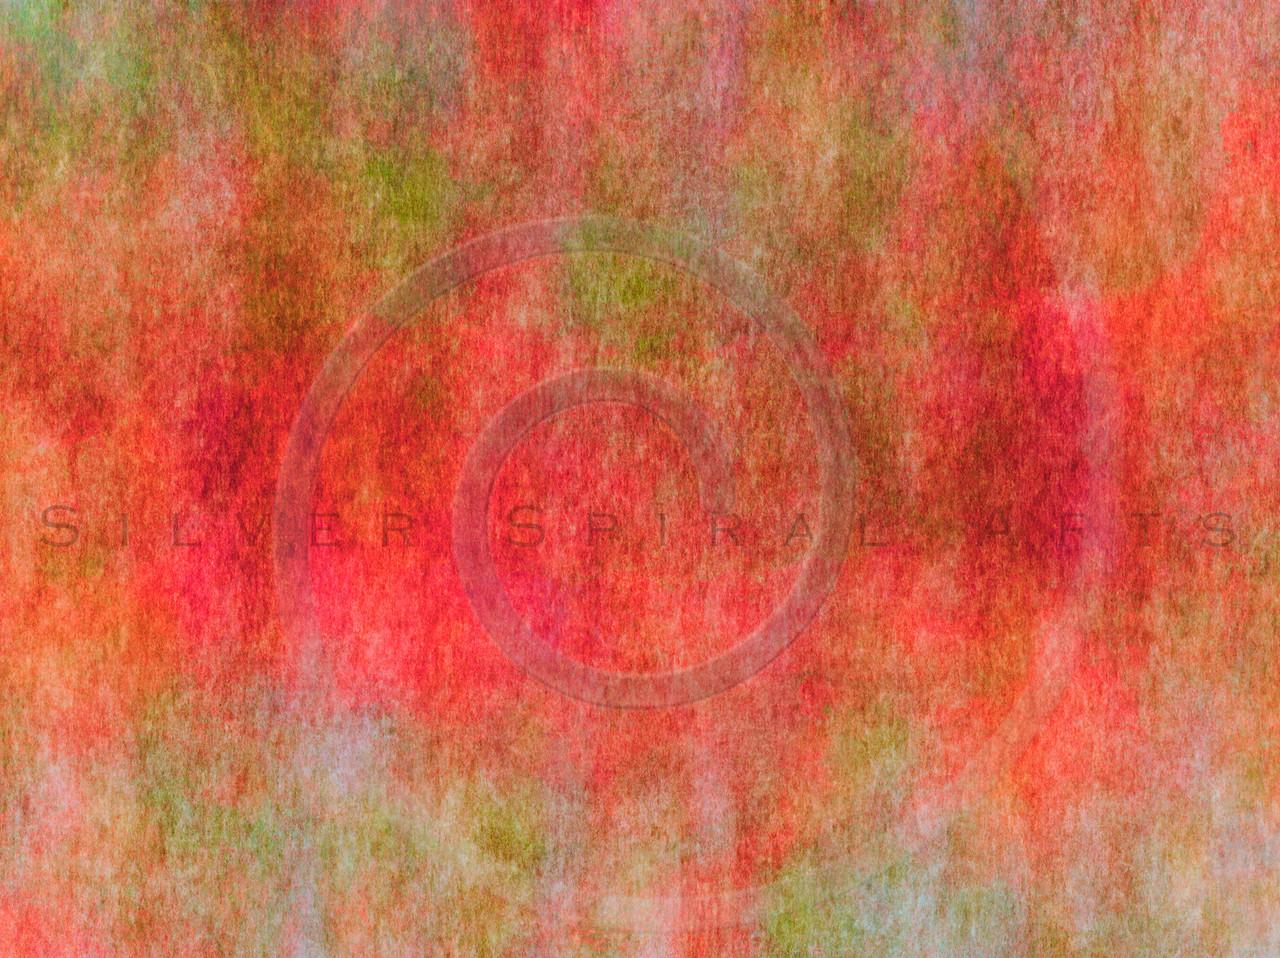 Pink Orange Green Watercolor Paper Texture Background